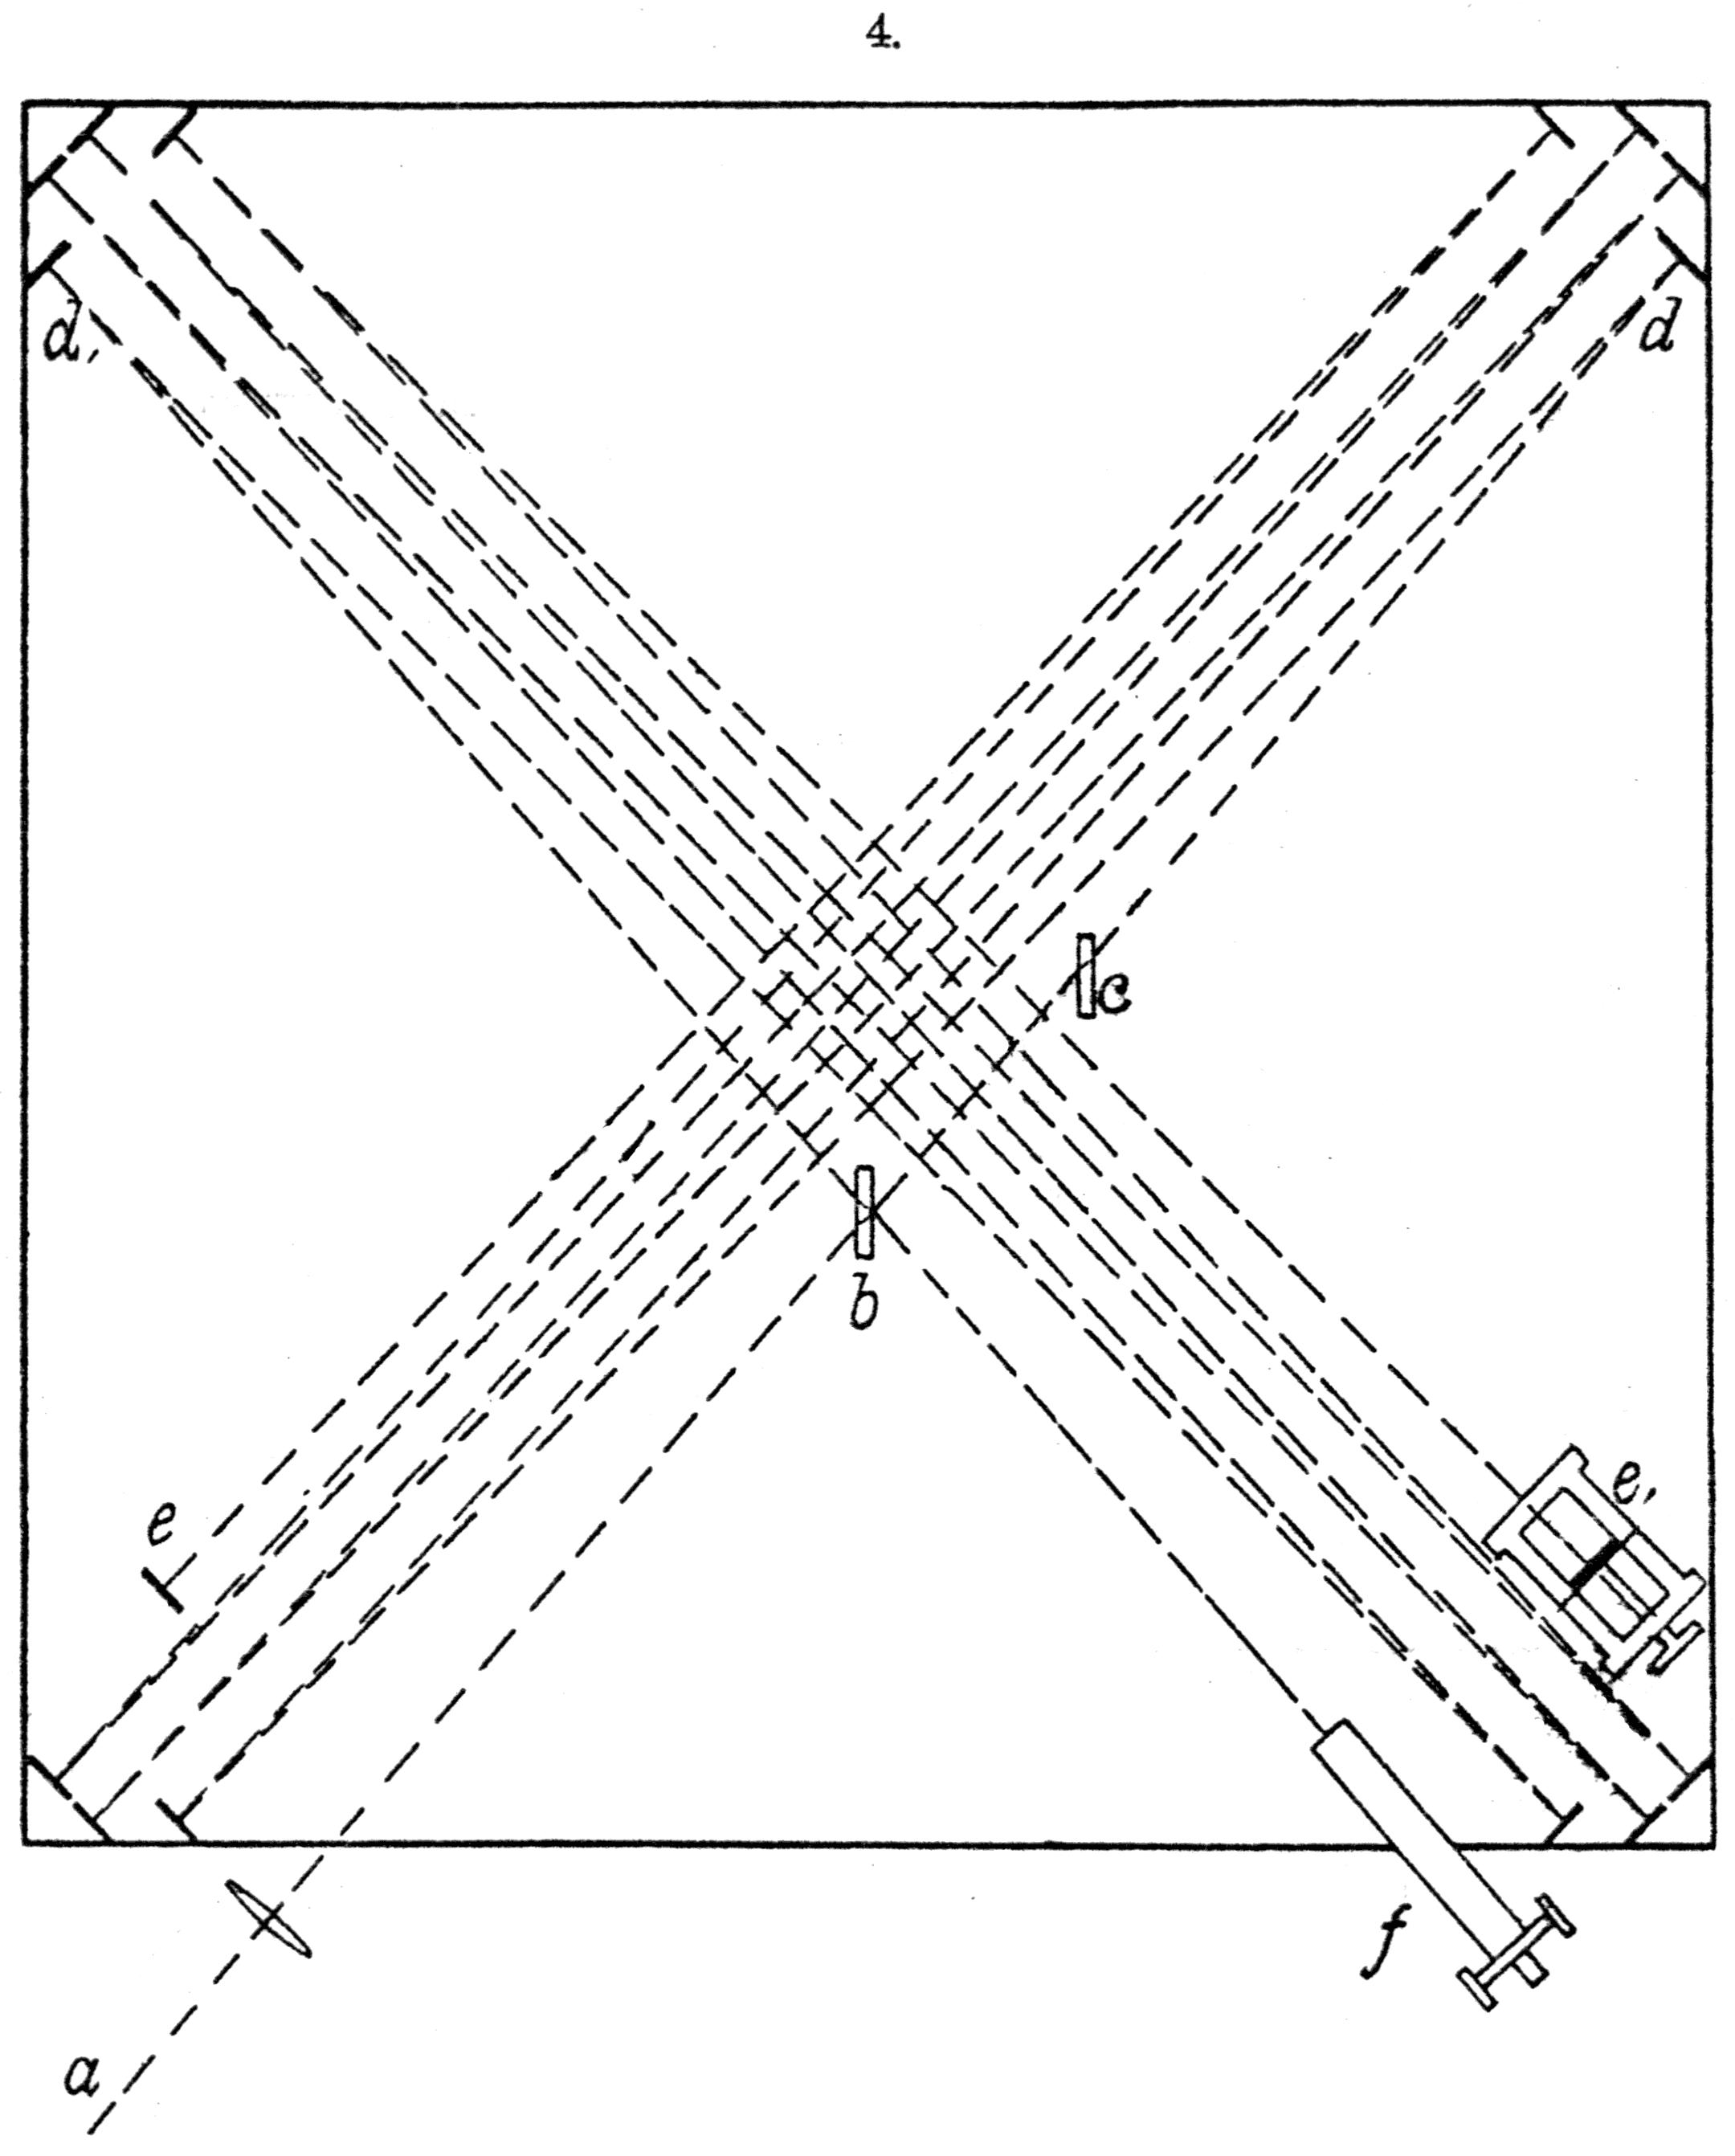 Schemat doświadczenia Michelsona-Morleya